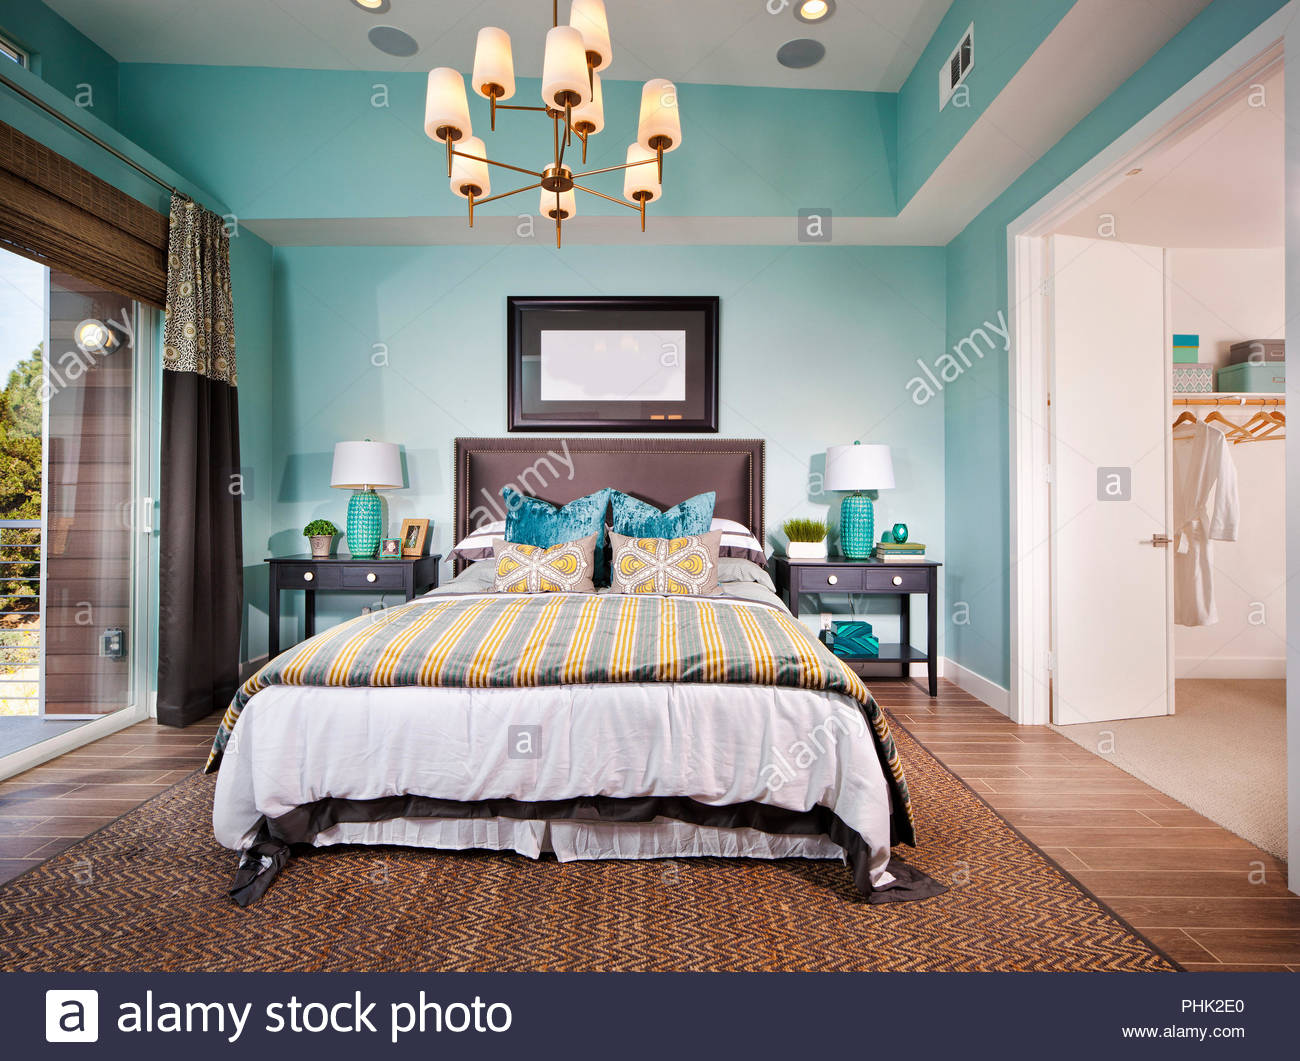 Dormitorio con lámpara de araña Imagen De Stock